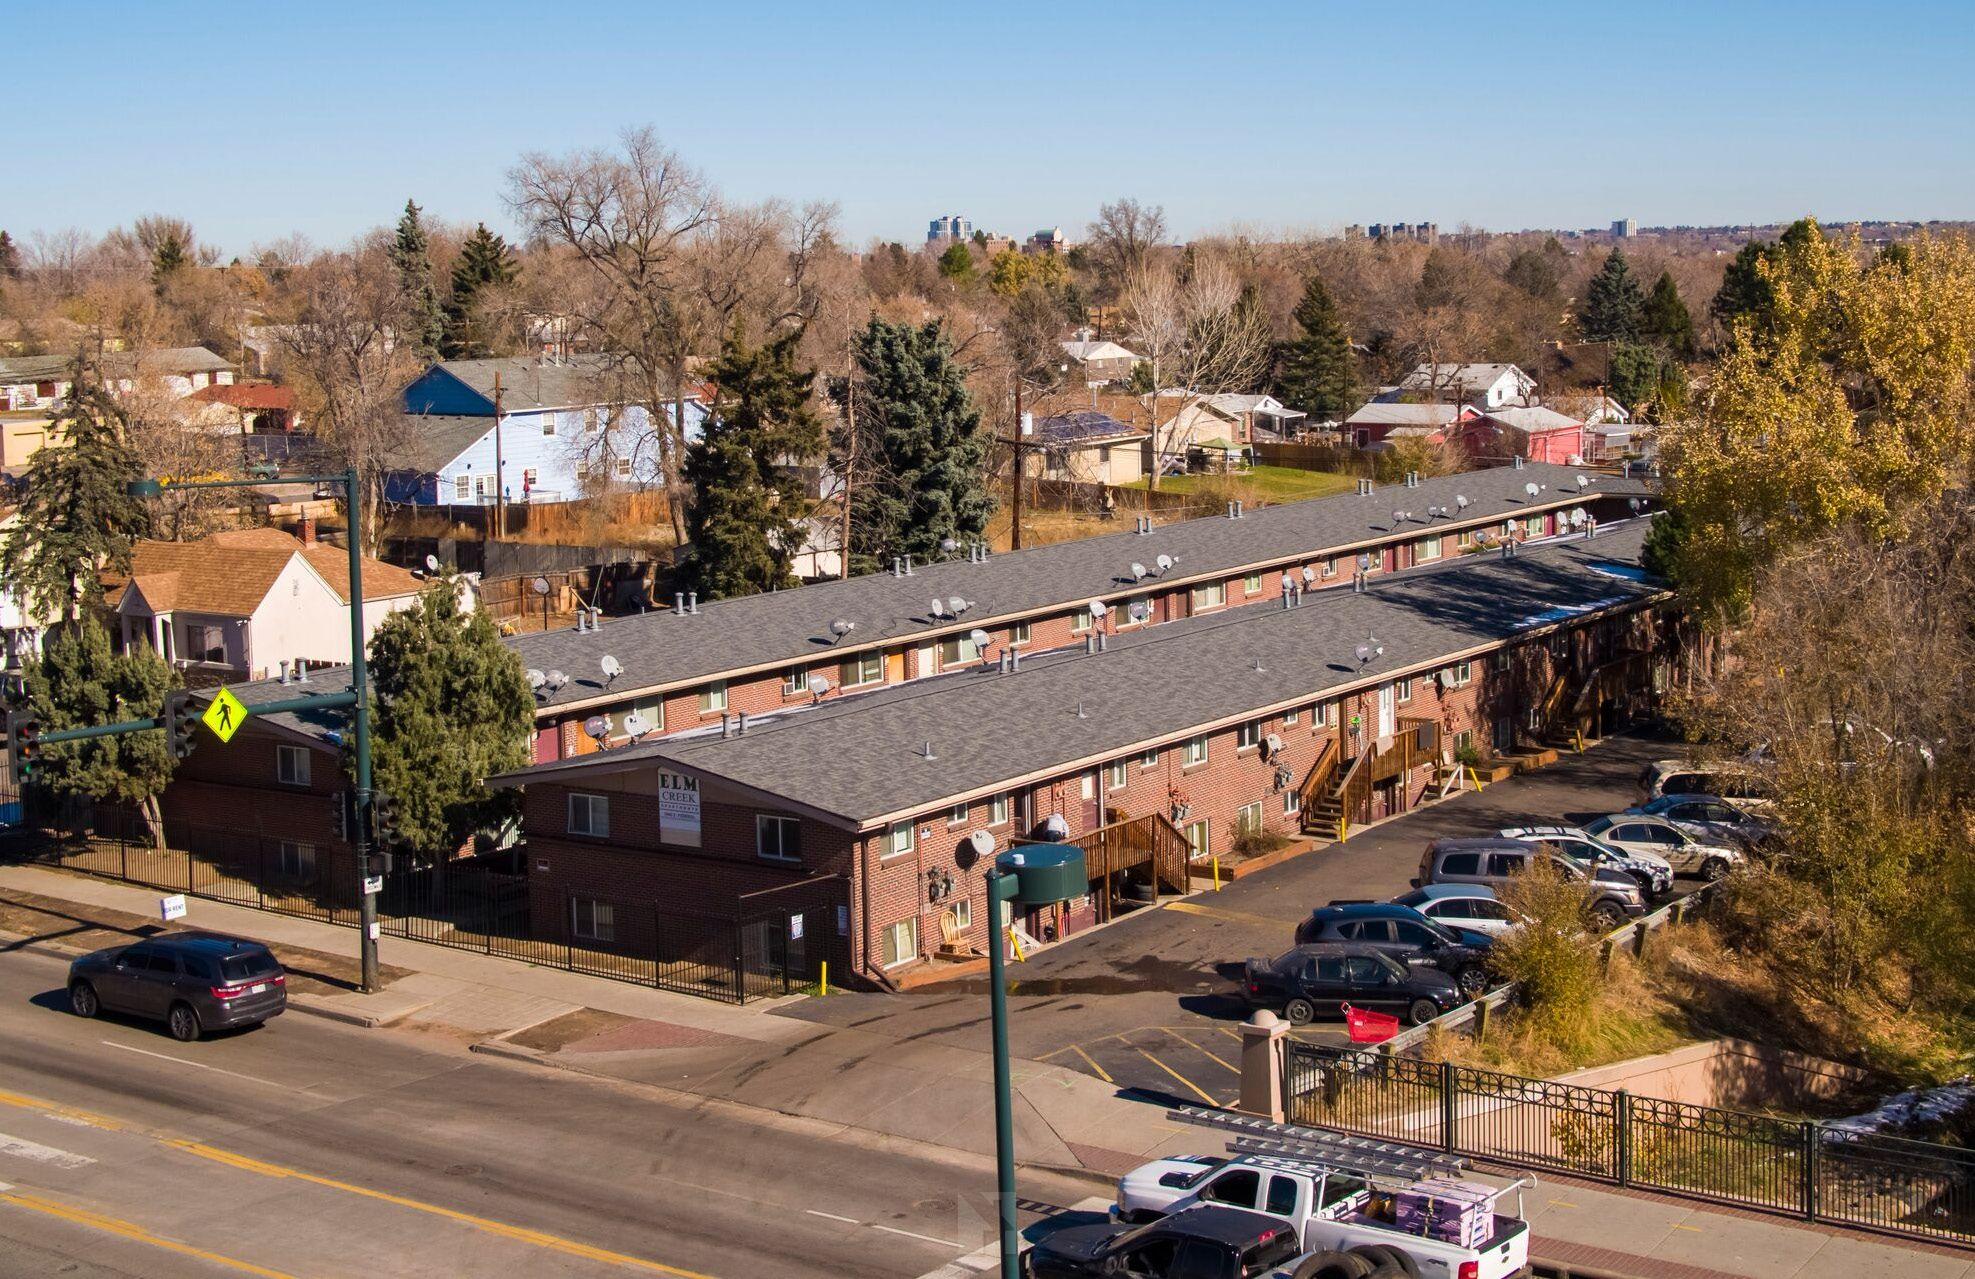 Colorado丹佛出租公寓,40单位,投资回报率6.08%